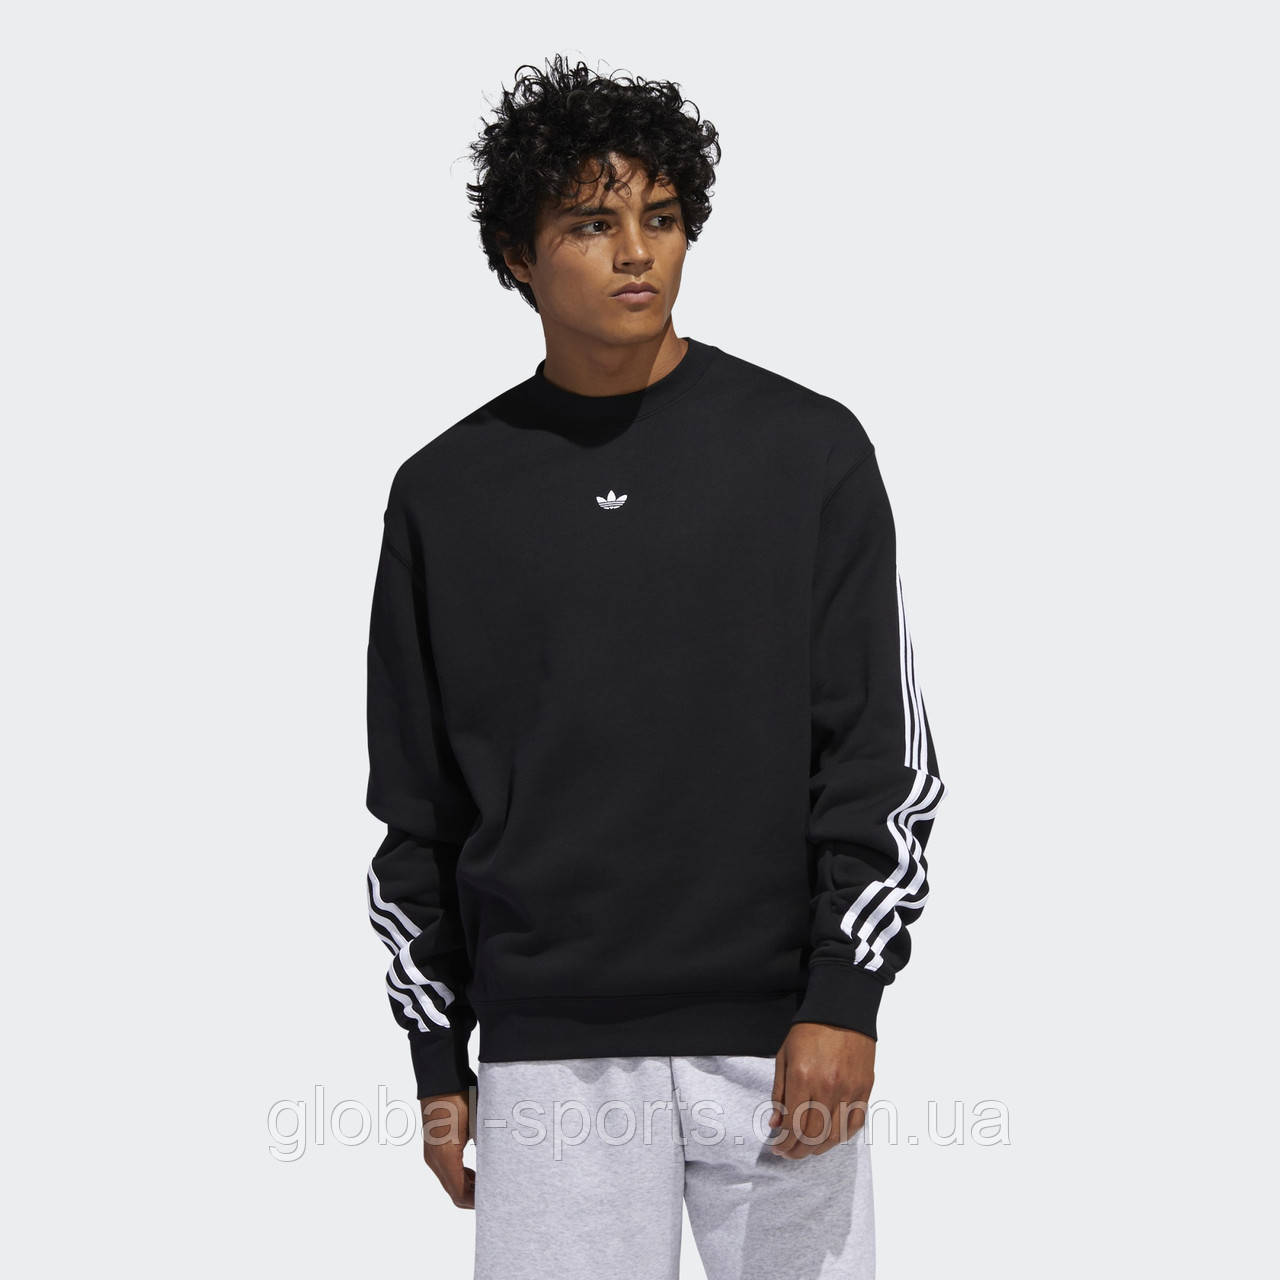 Мужской свитшот Adidas 3-Stripes Wrap (Артикул:FM1522)